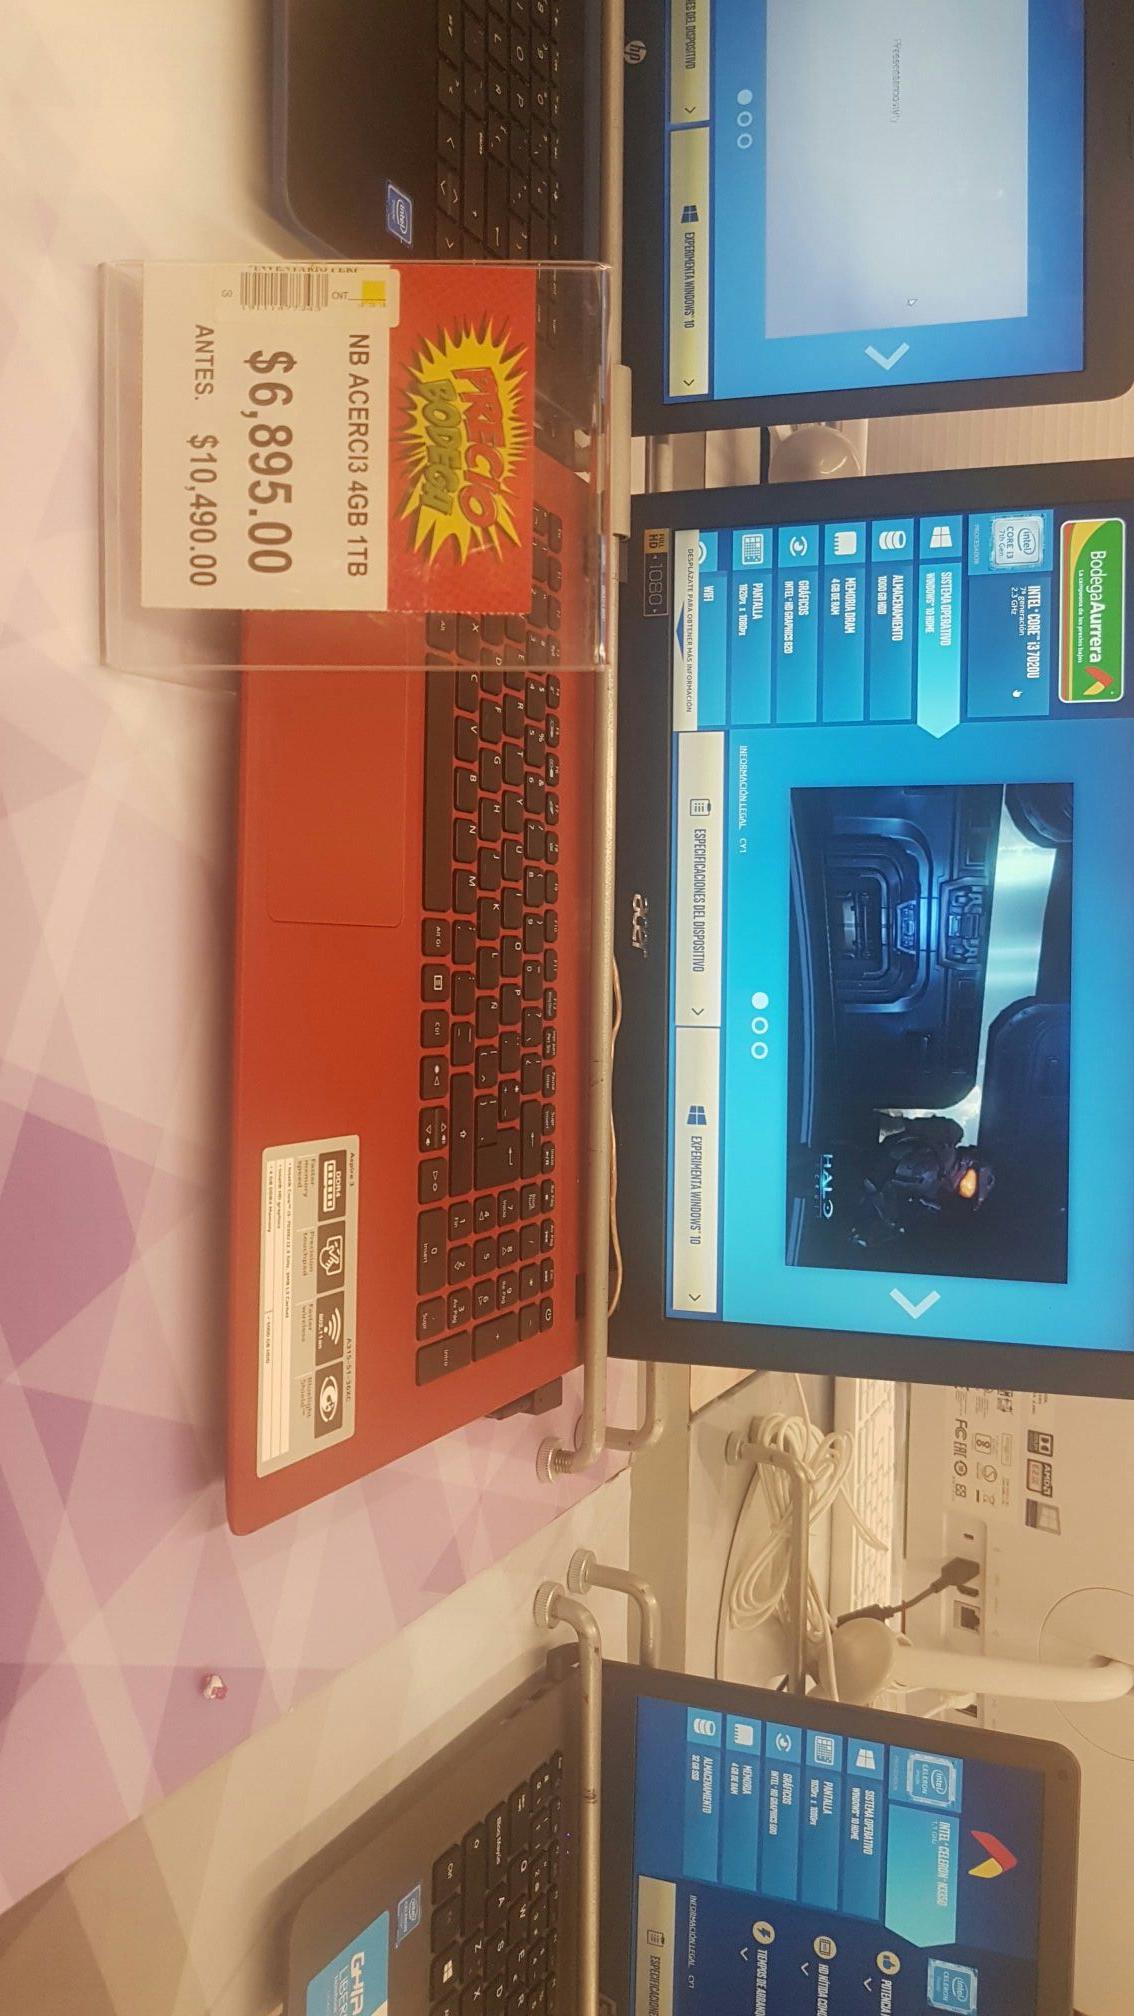 Bodega Aurrerá: Laptop Nb Acer i3 7ma generacion